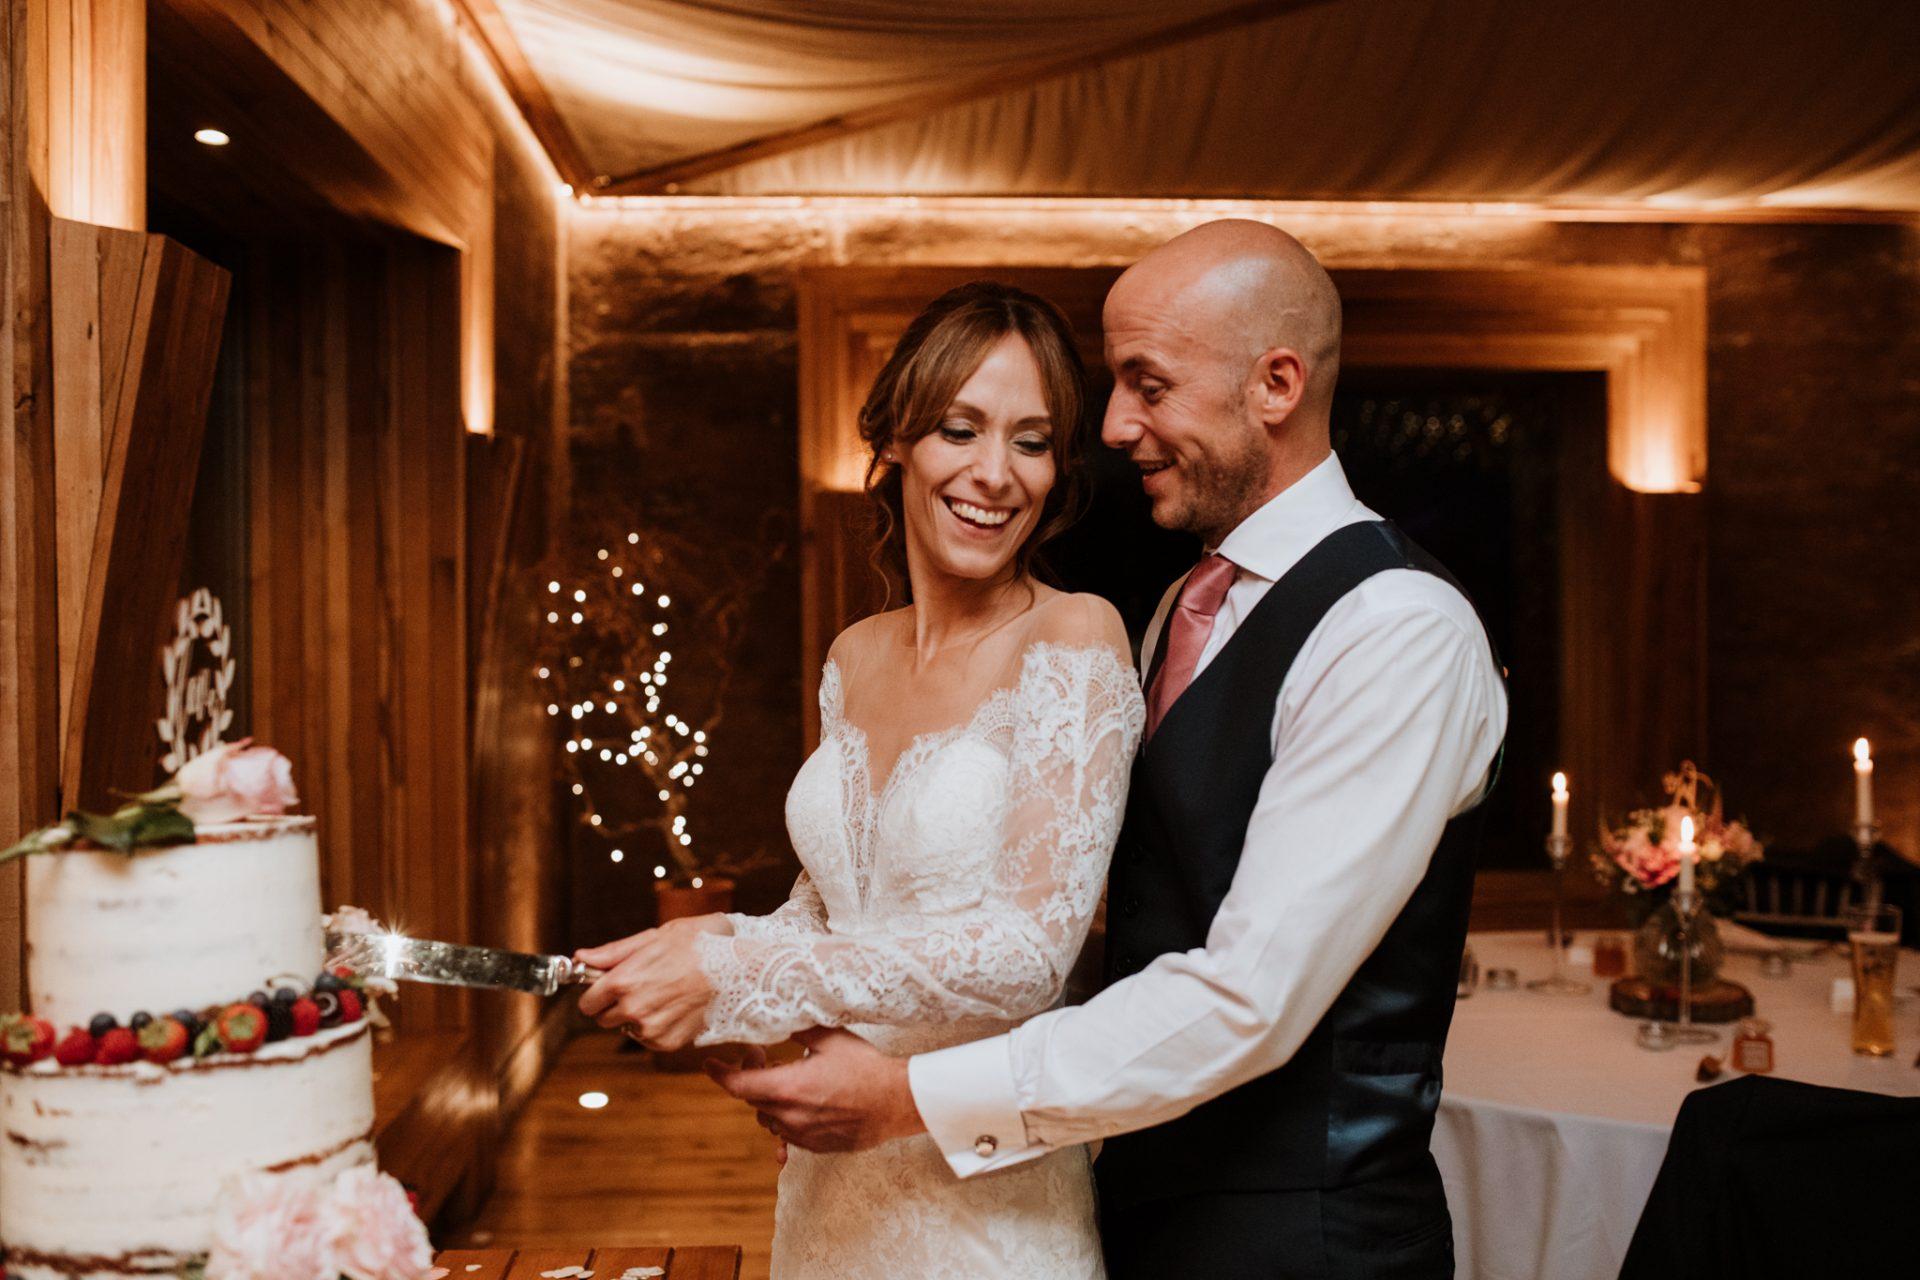 bride and groom cut naked wedding cake